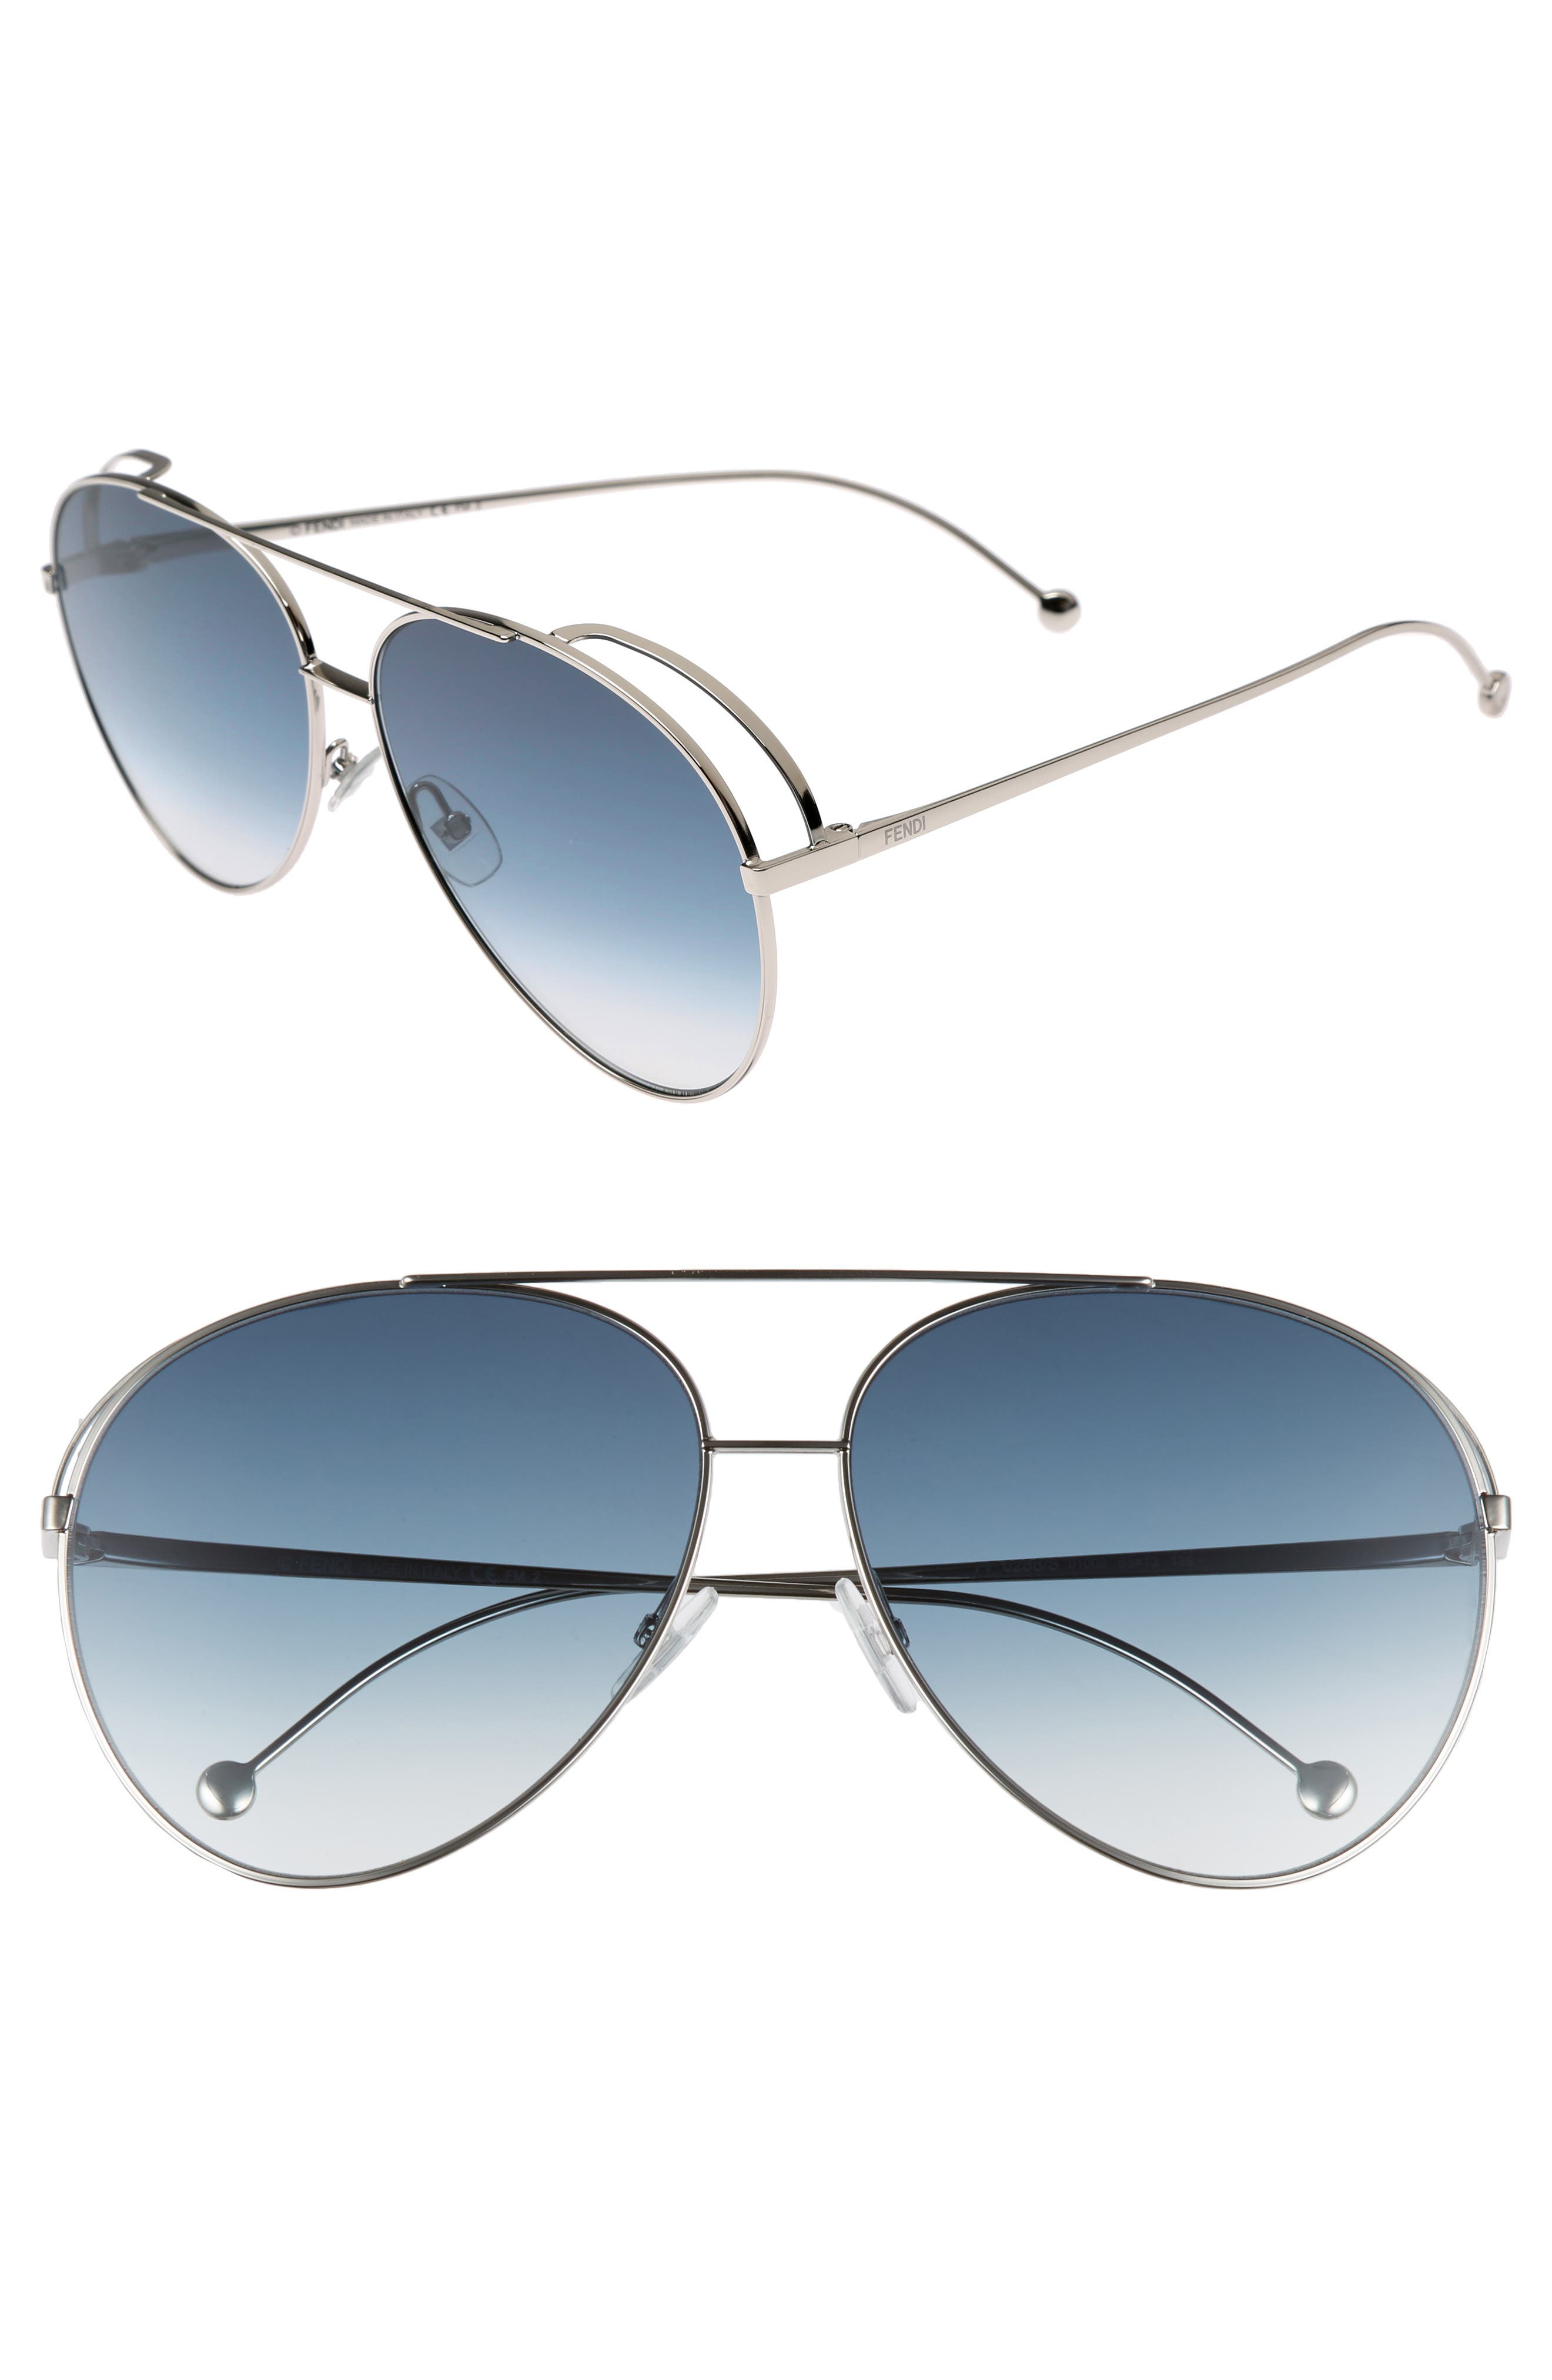 52mm Aviator Sunglasses,                             Main thumbnail 1, color,                             PALLADIUM